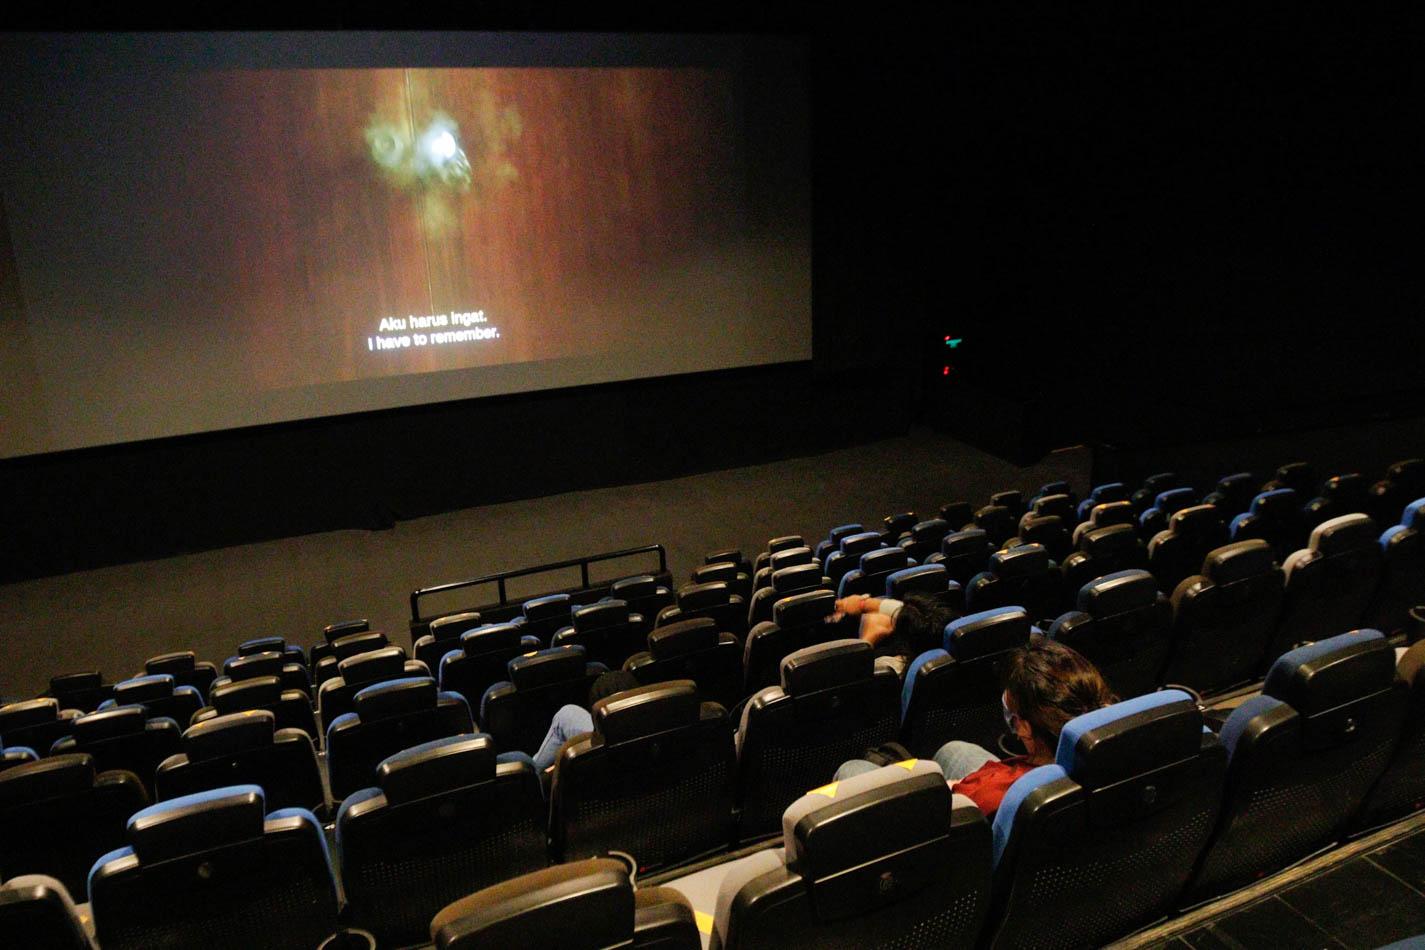 Wajib Vaksin 2 Kali Jadi Syarat Masuk Bioskop di Sleman